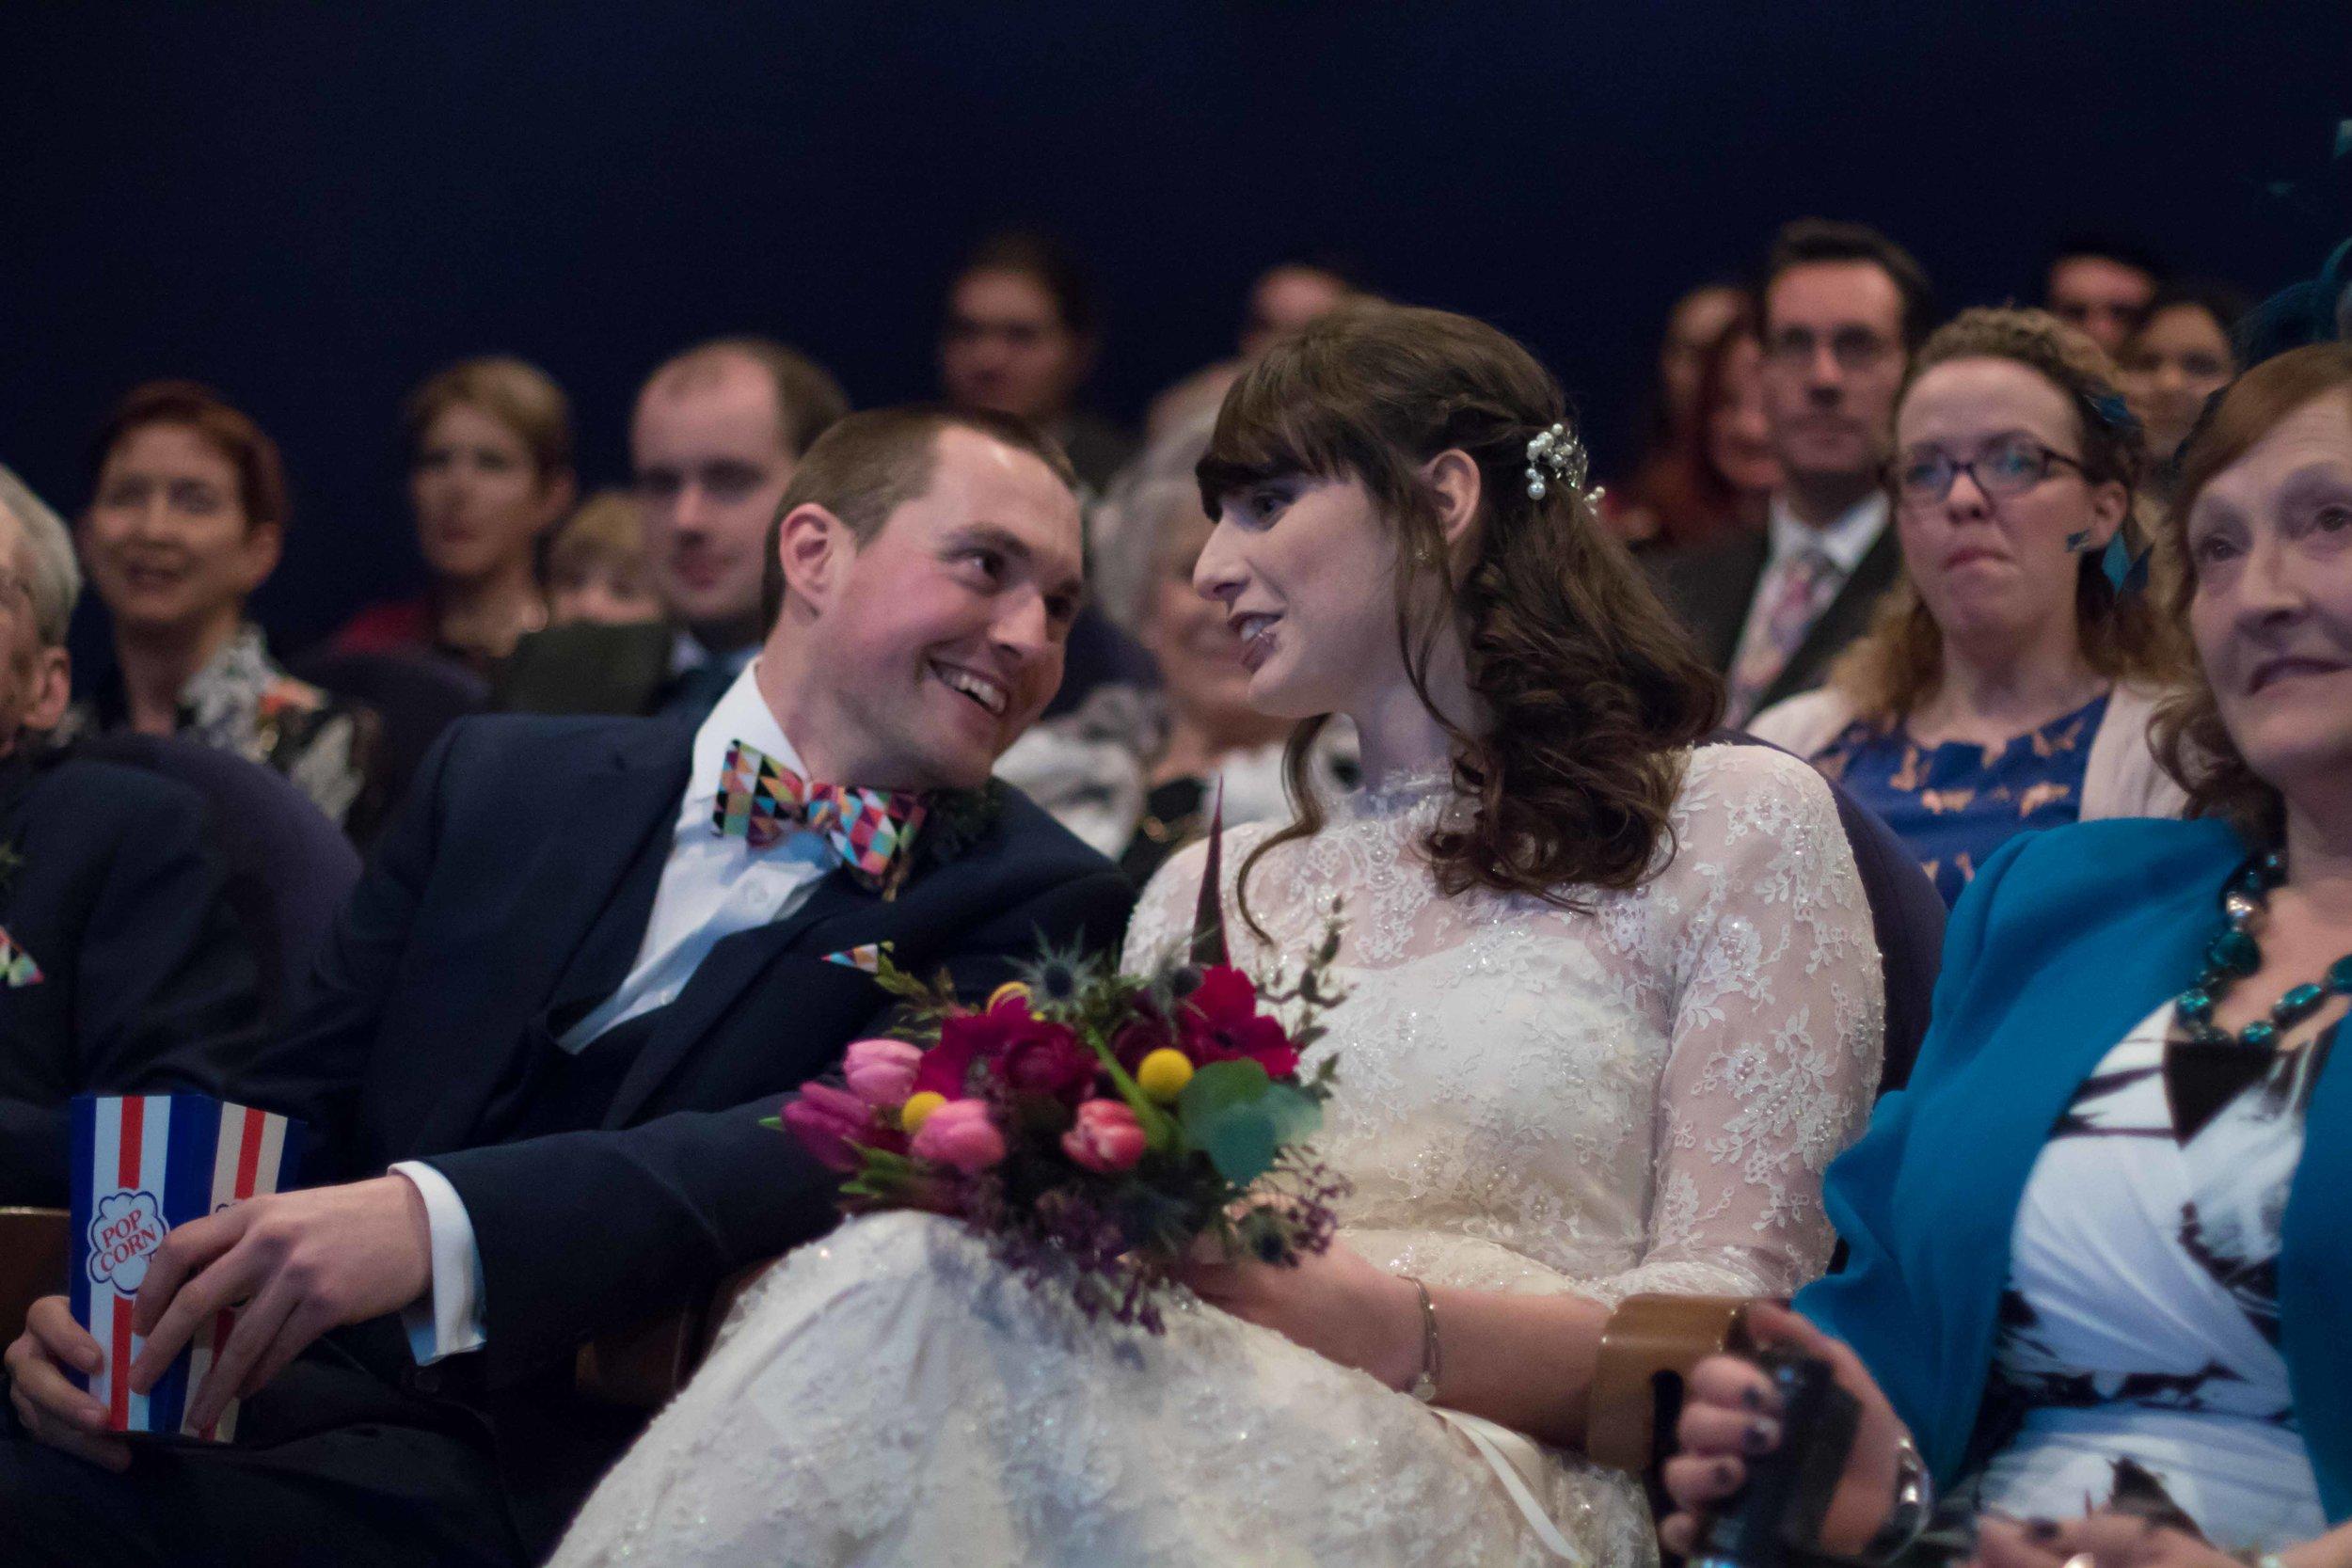 Adam & Faye - Wright Wedding Photography - Bristol Wedding Photographer -86.jpg